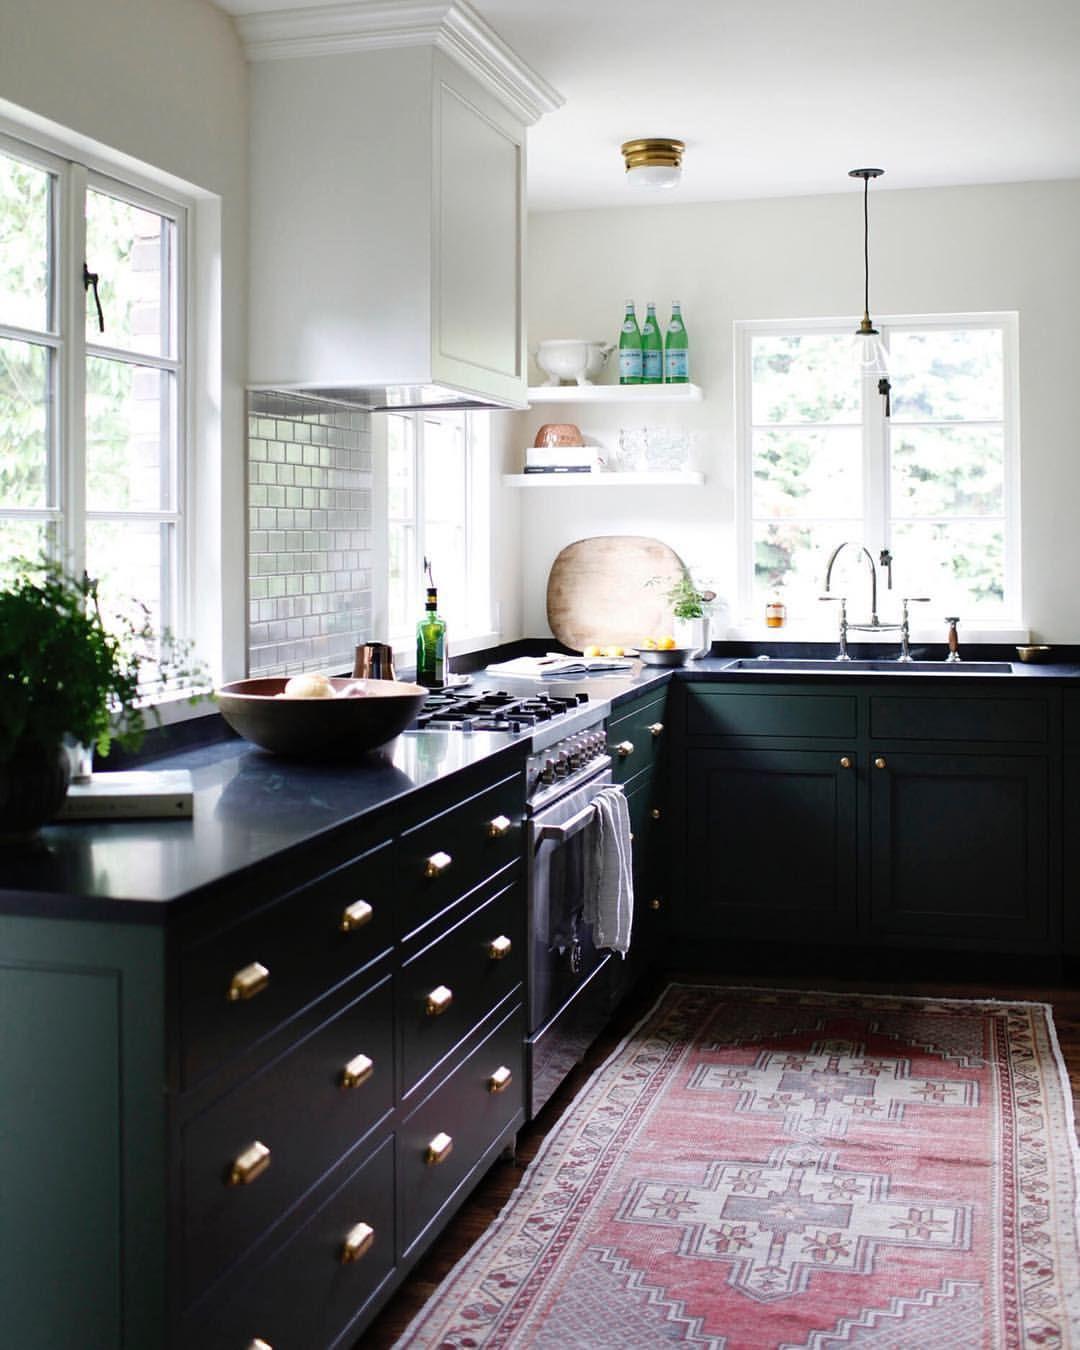 When designing a kitchen or bathroom i always encourage my clients